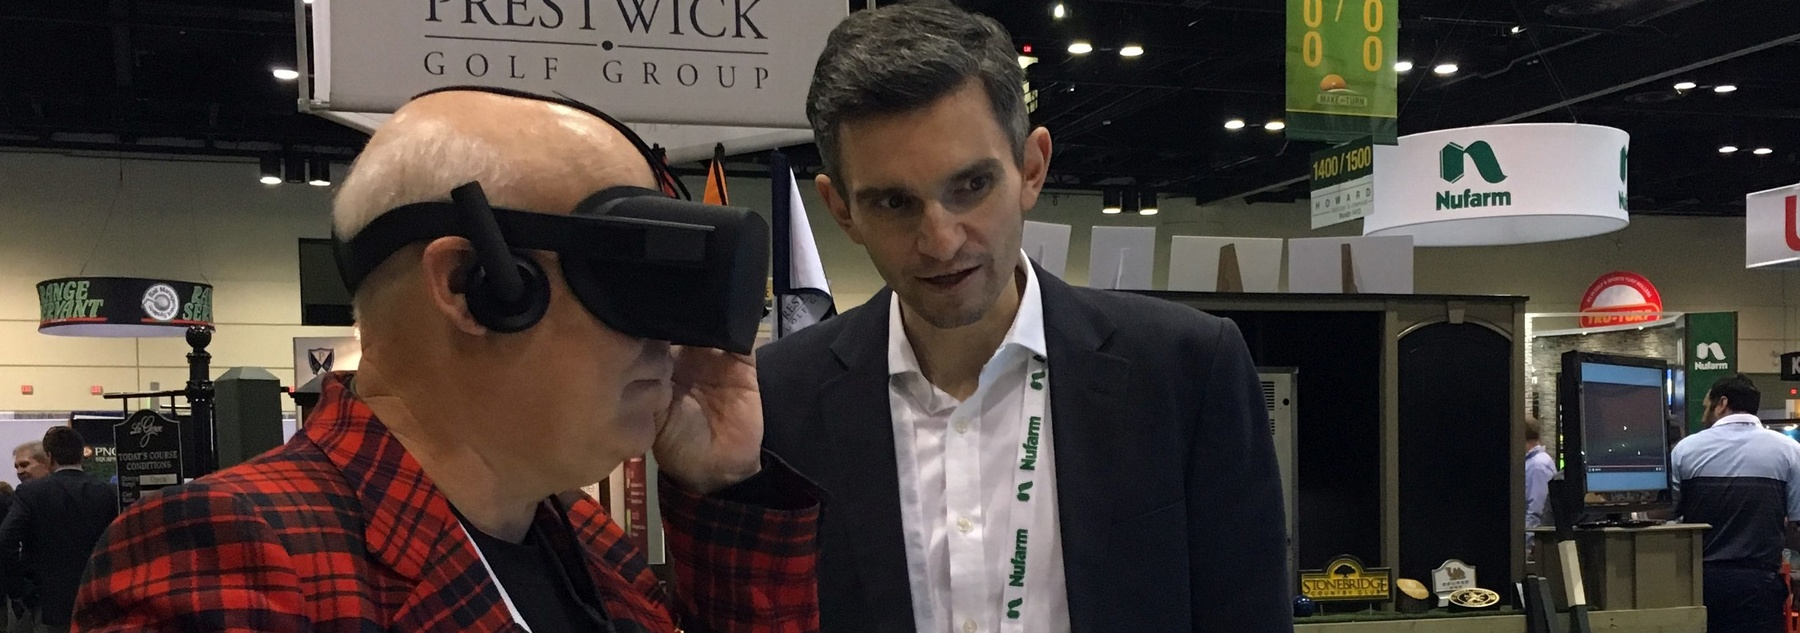 forrest-richardson-testing-the-oculus-virtual-reality (002)